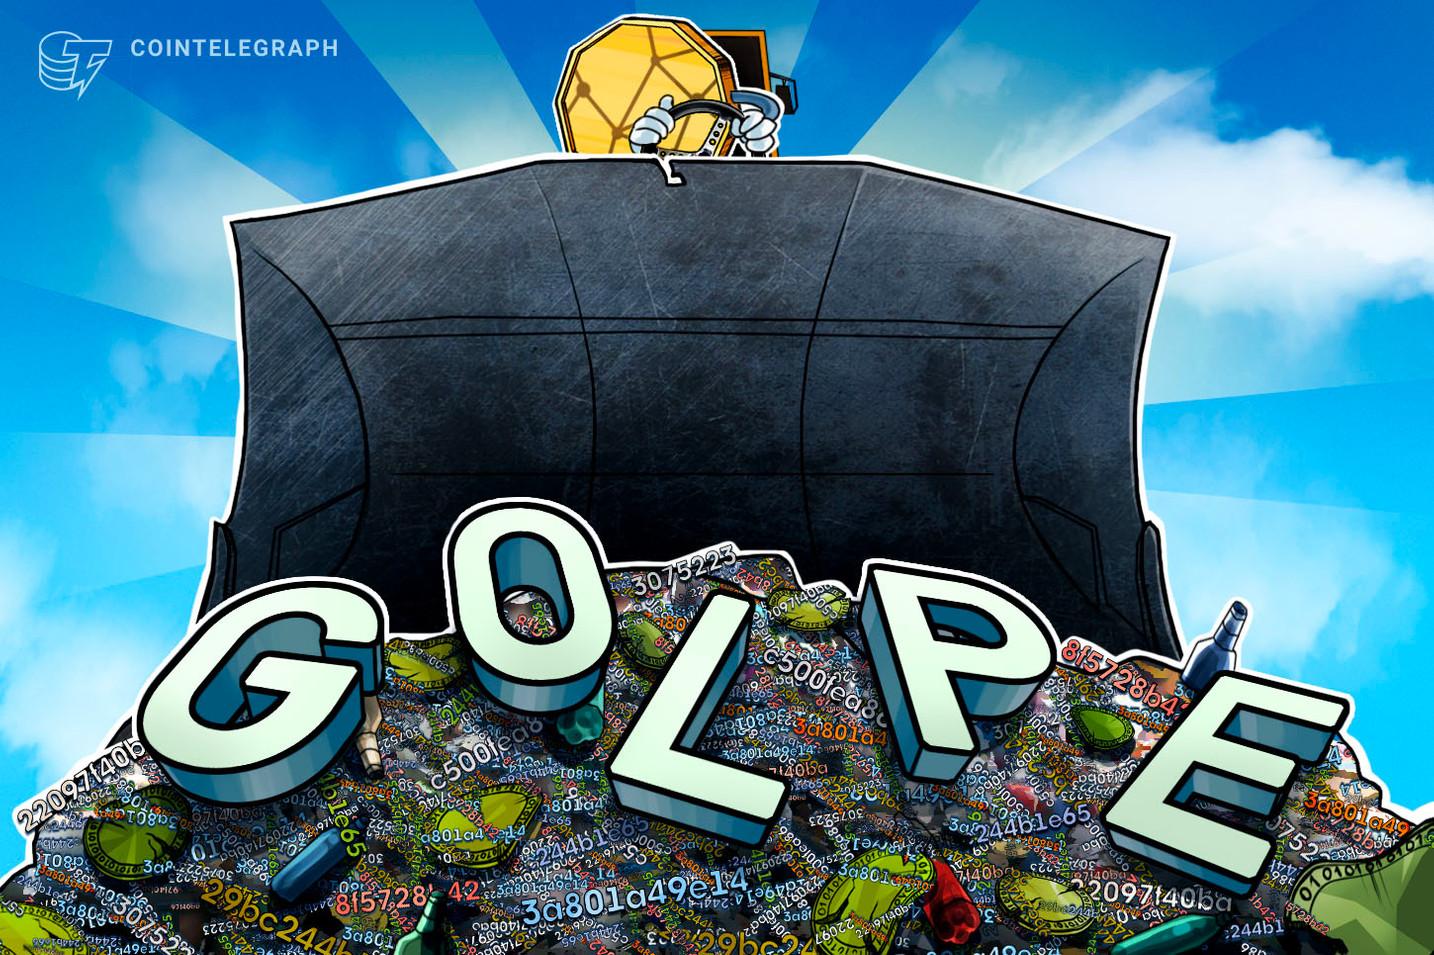 Gerente do Itaú promovia pirâmide de Bitcoin e foi demitida por justa causa